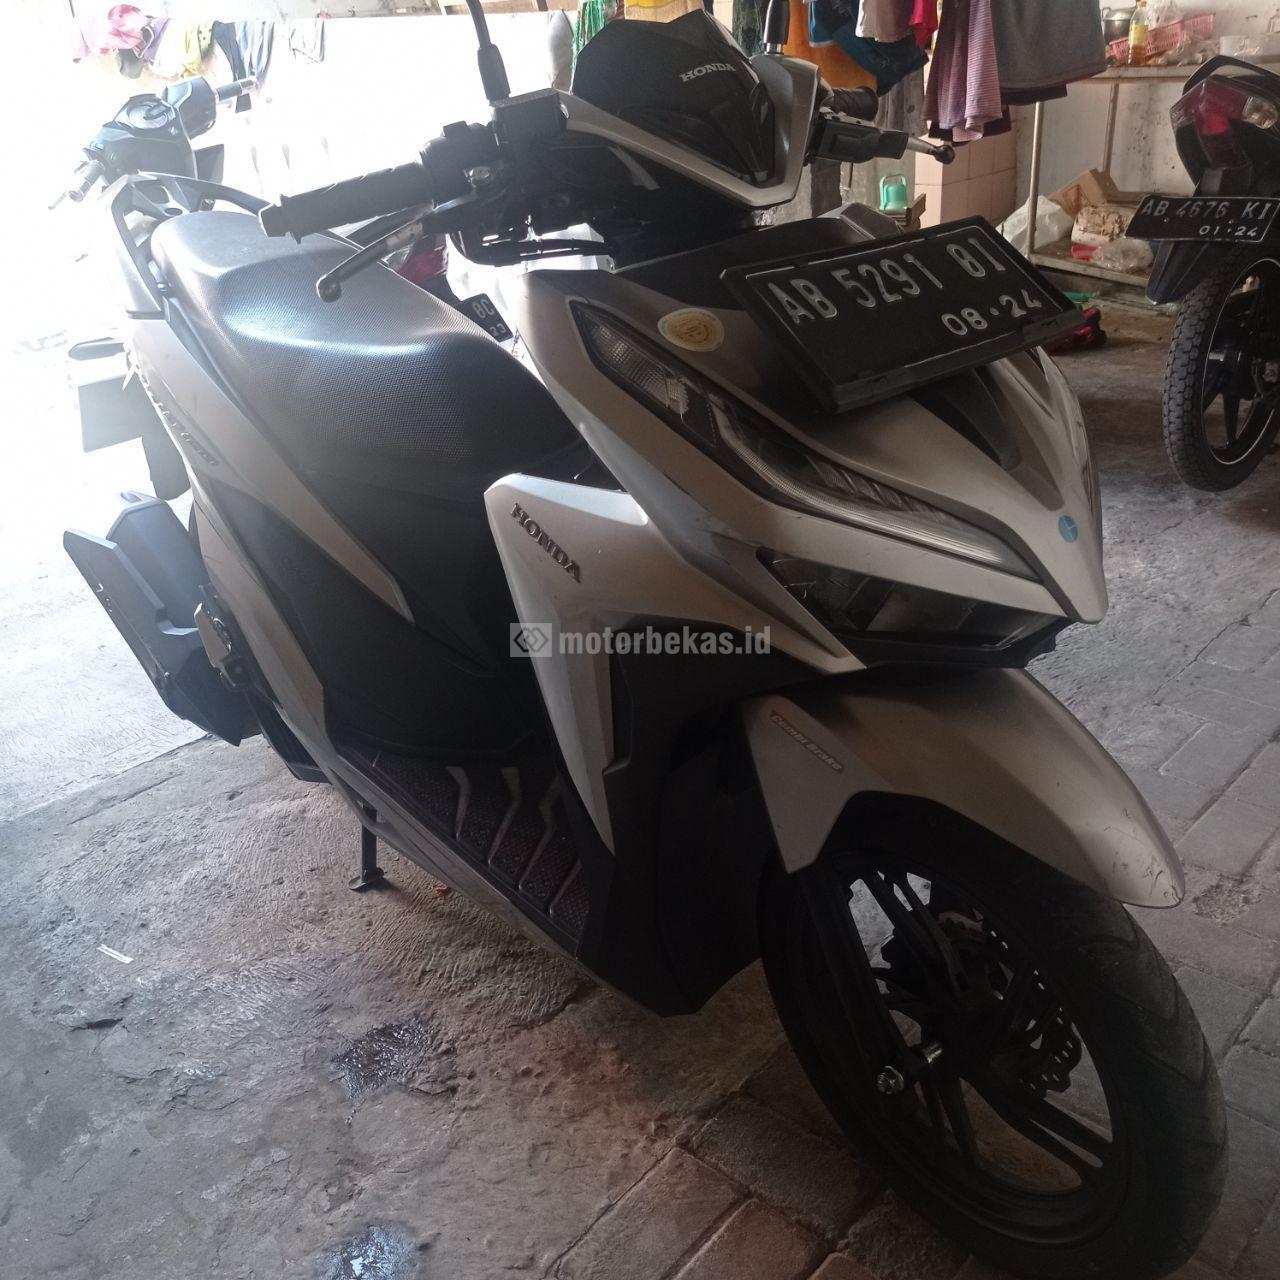 HONDA VARIO 150  2019 motorbekas.id